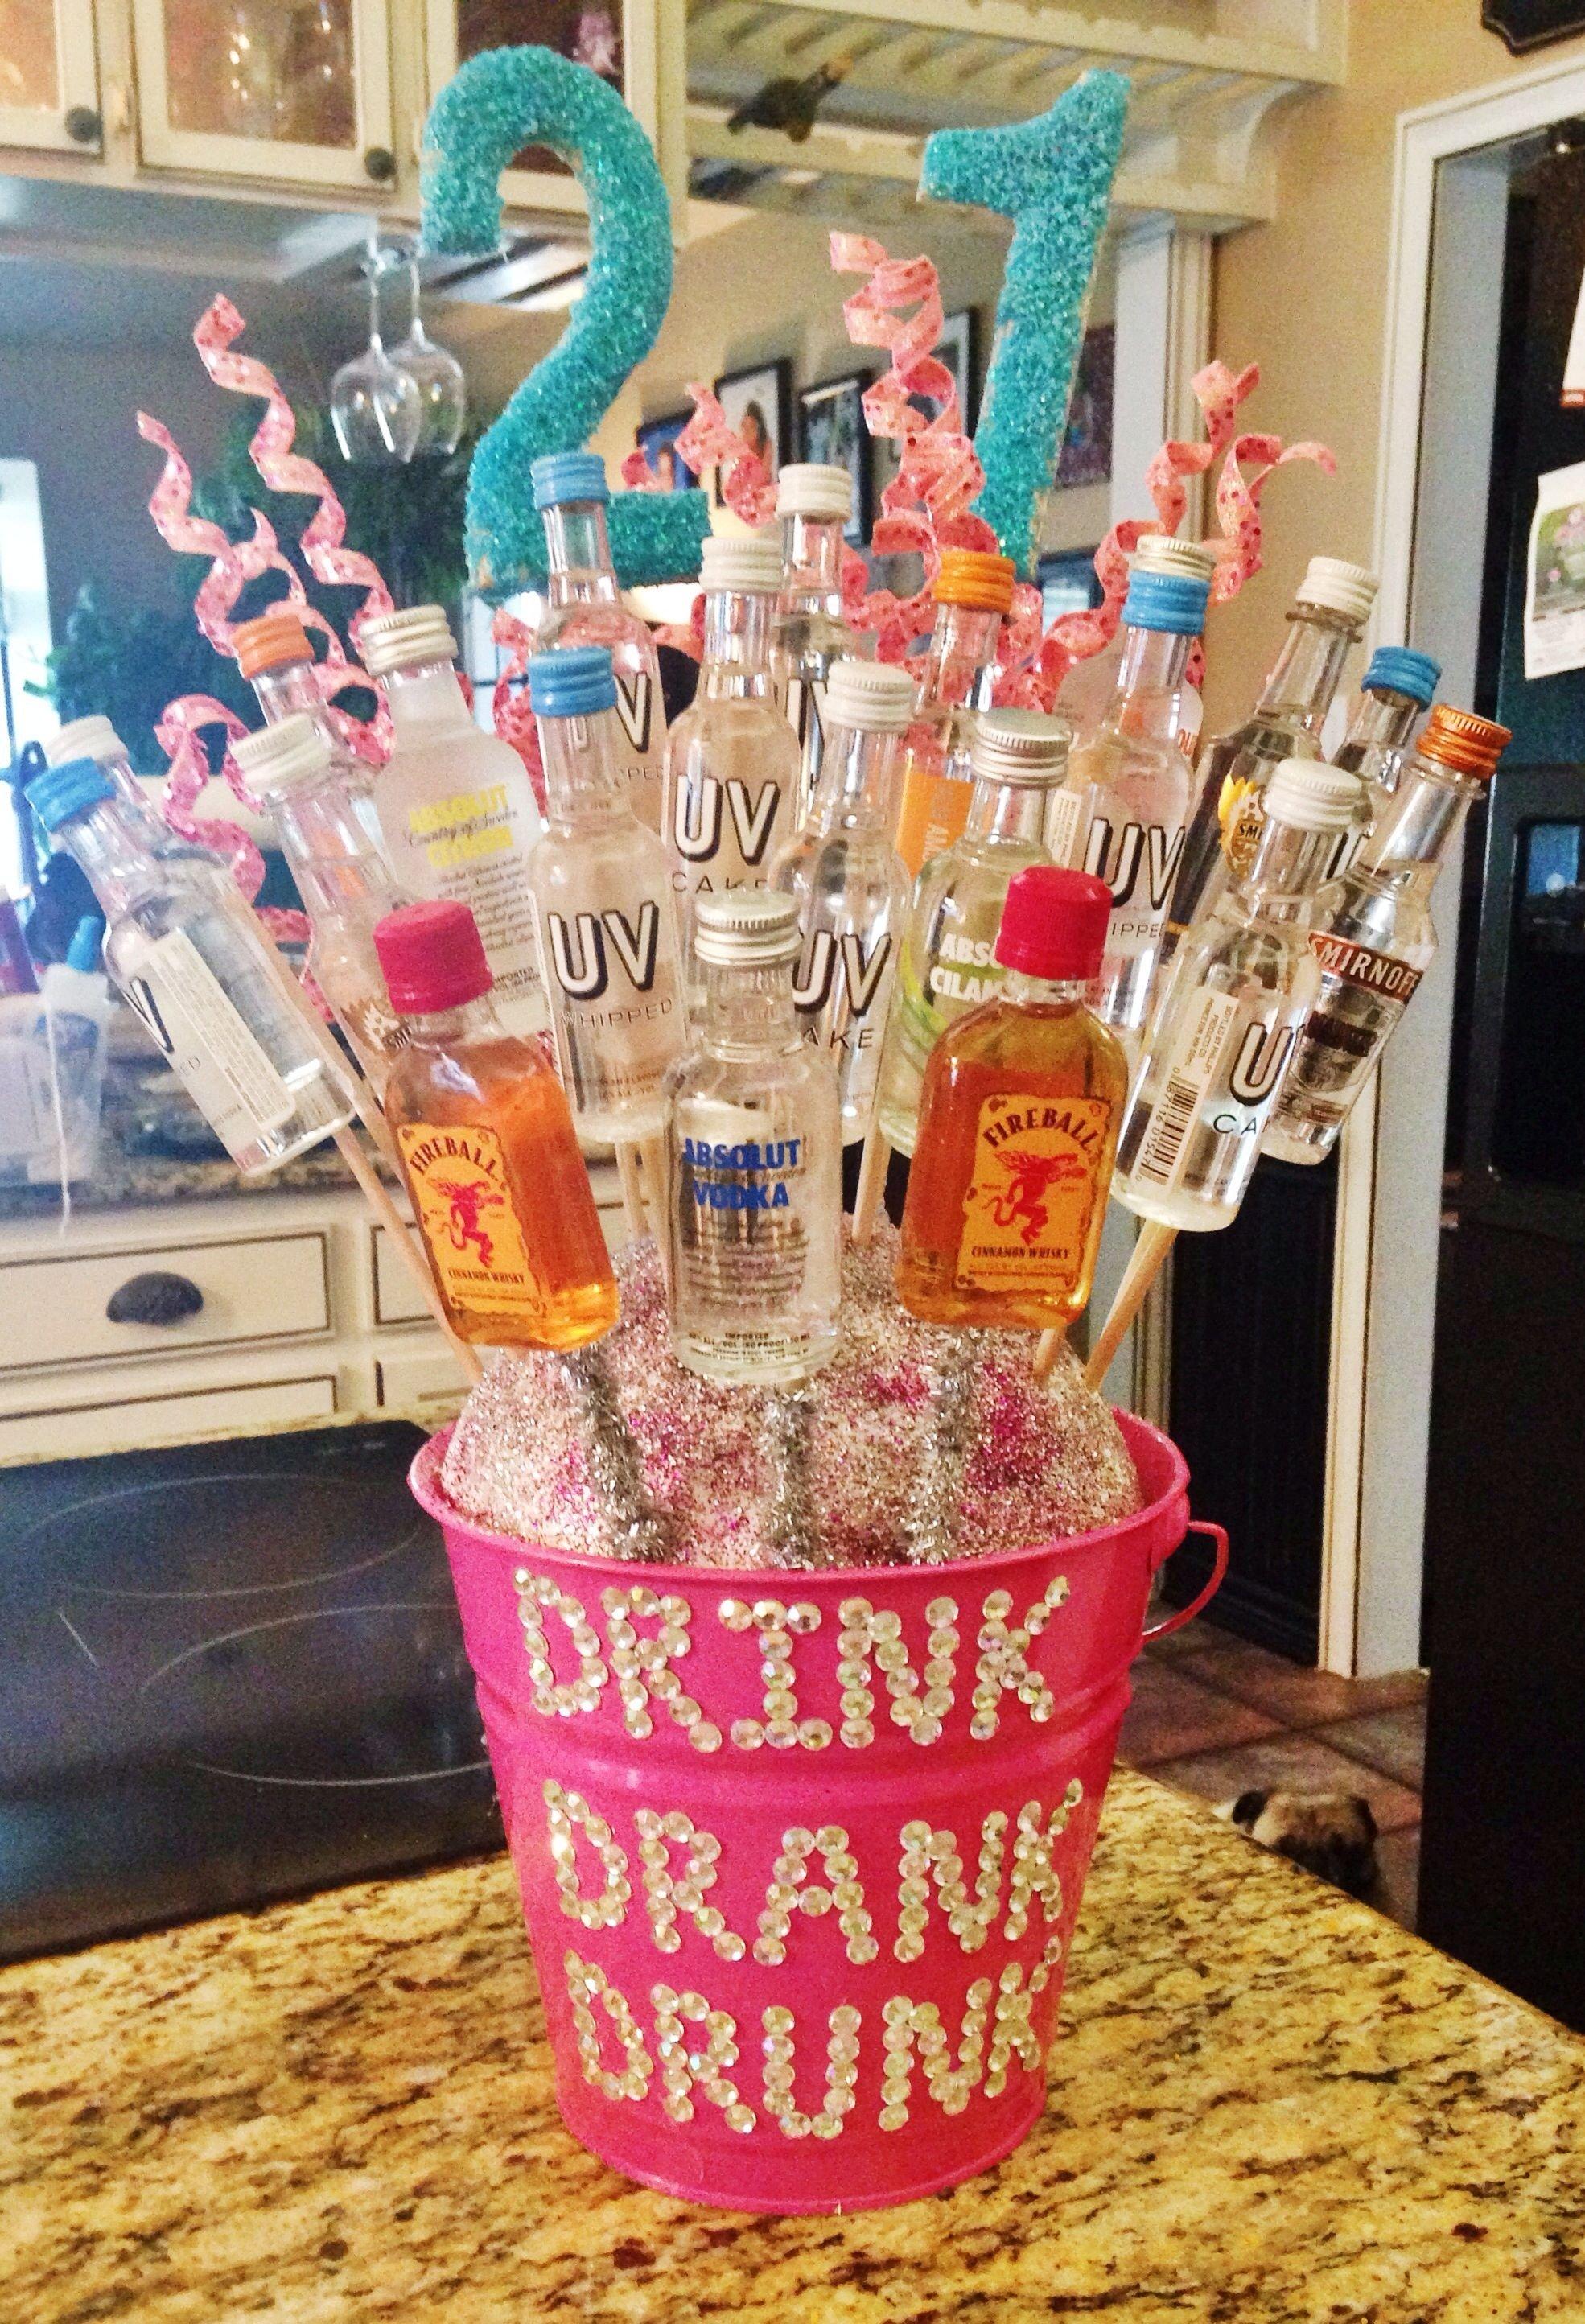 10 Cute Christmas Present Ideas For Best Friends 21st alcohol bouquet i made for my best friend diy pinterest 6 2020